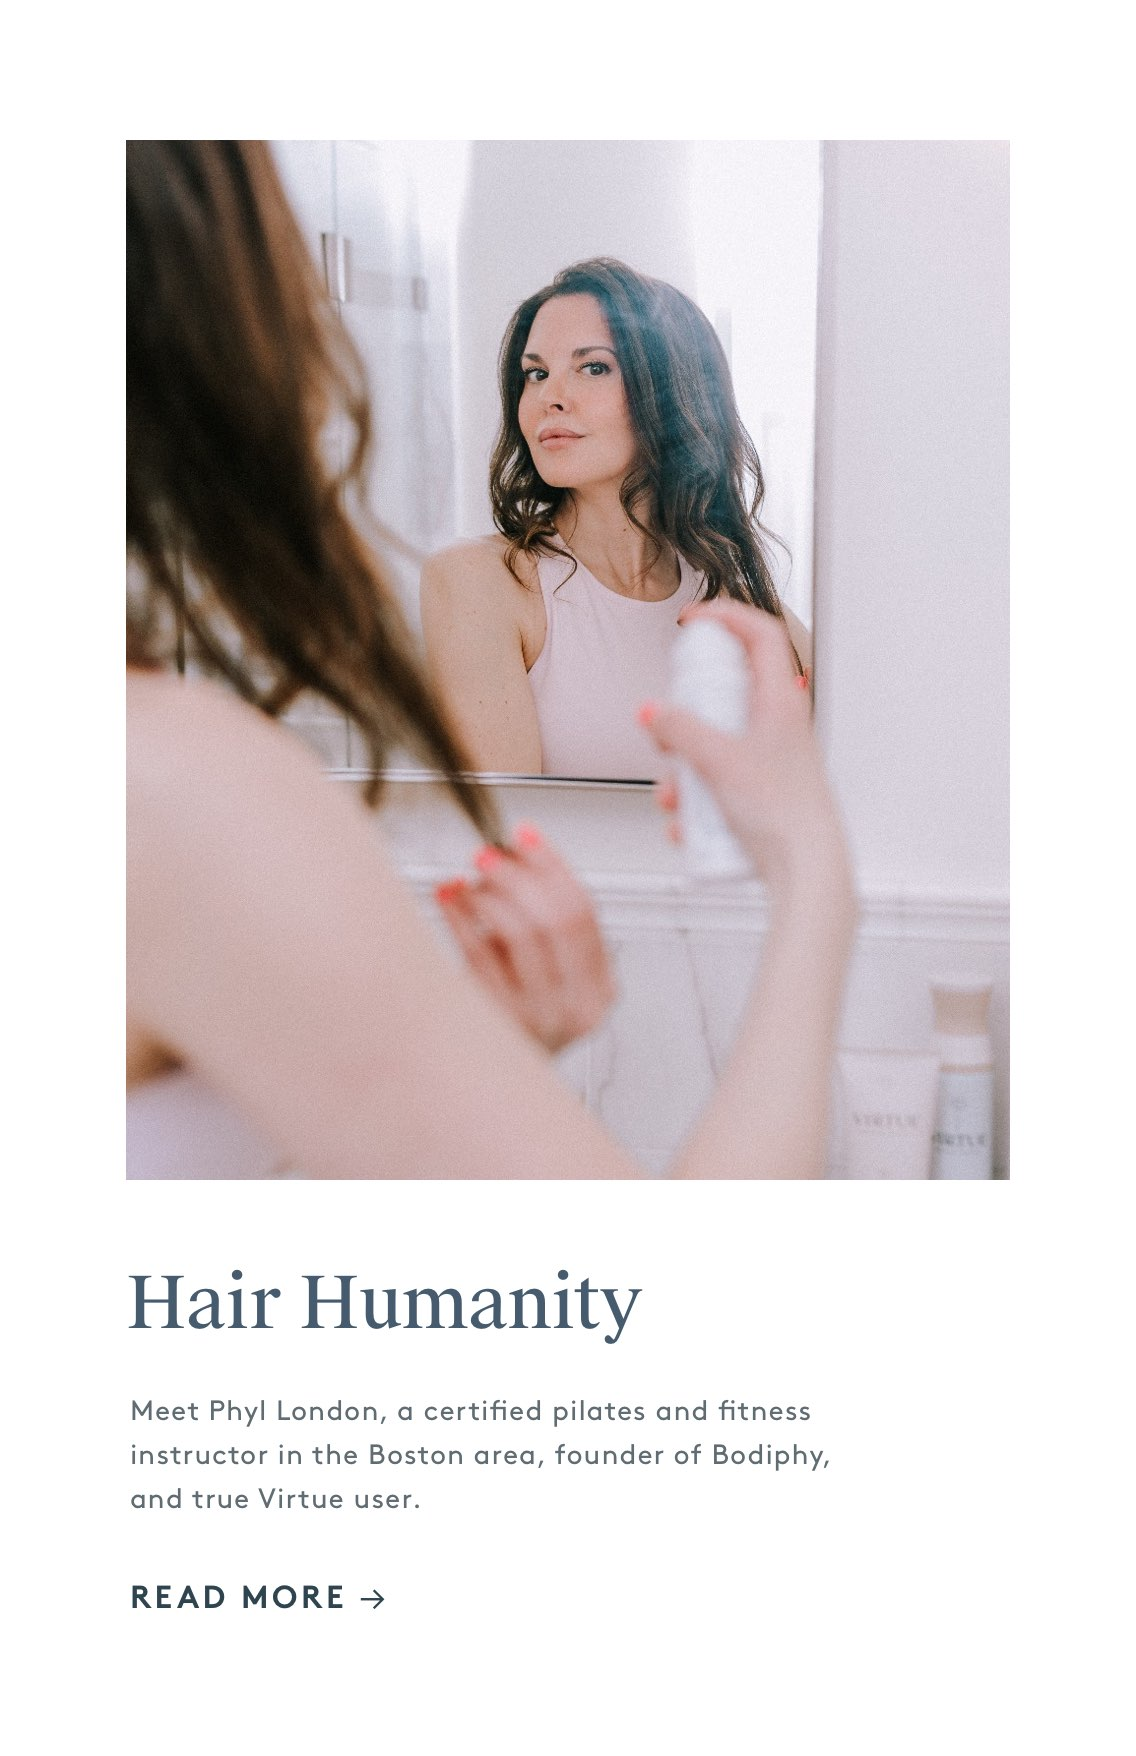 Hair Humanity